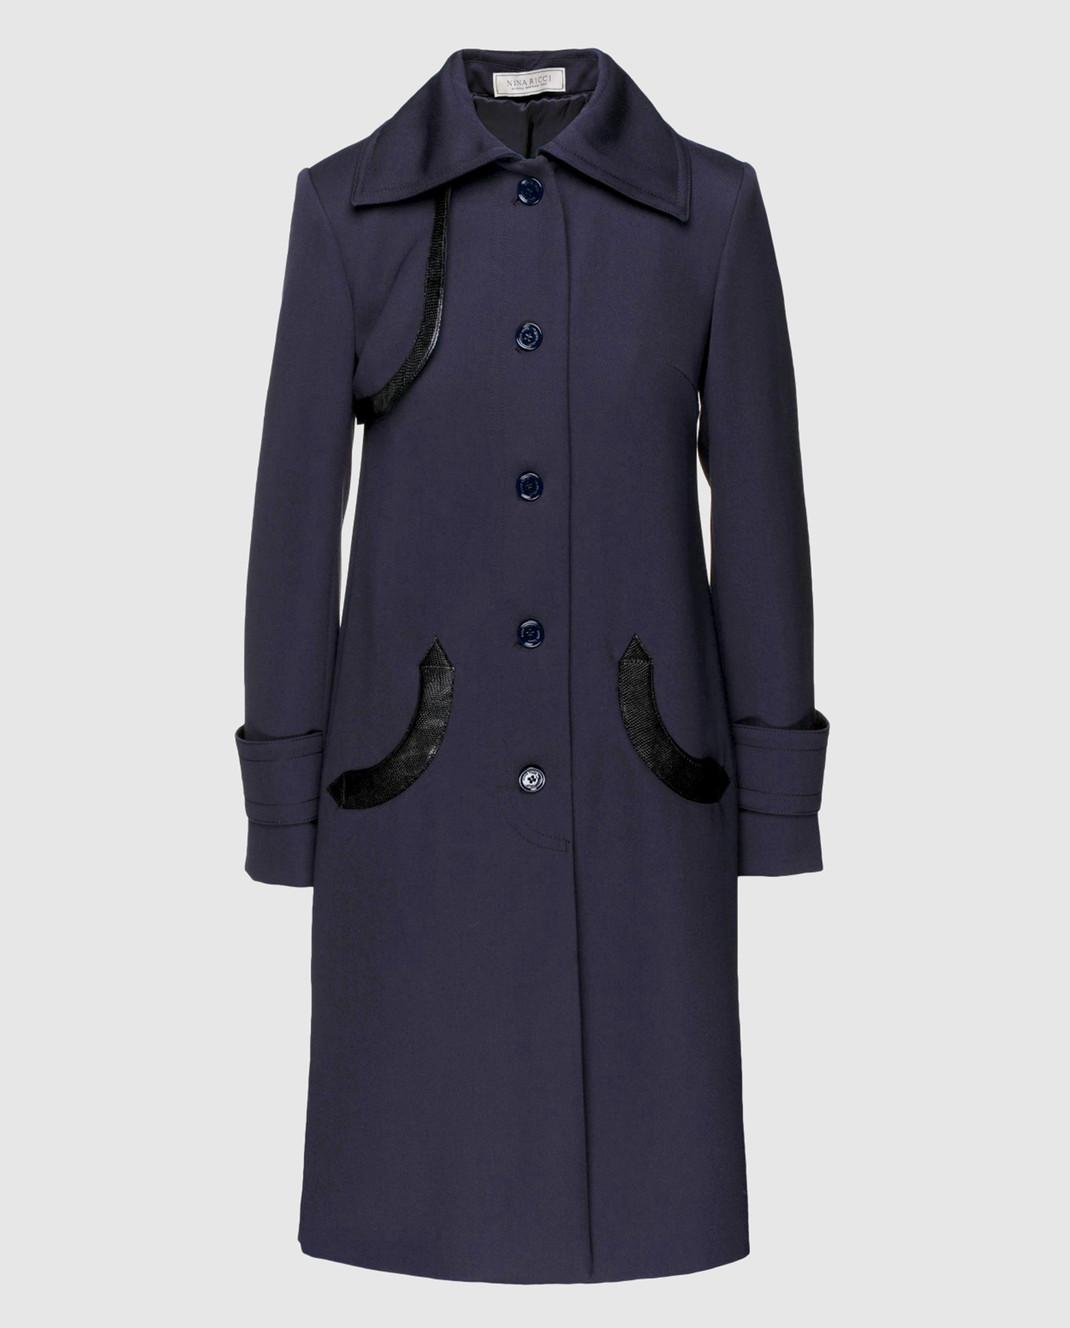 NINA RICCI Темно-синее пальто из шерсти 17HCMA016WV0220